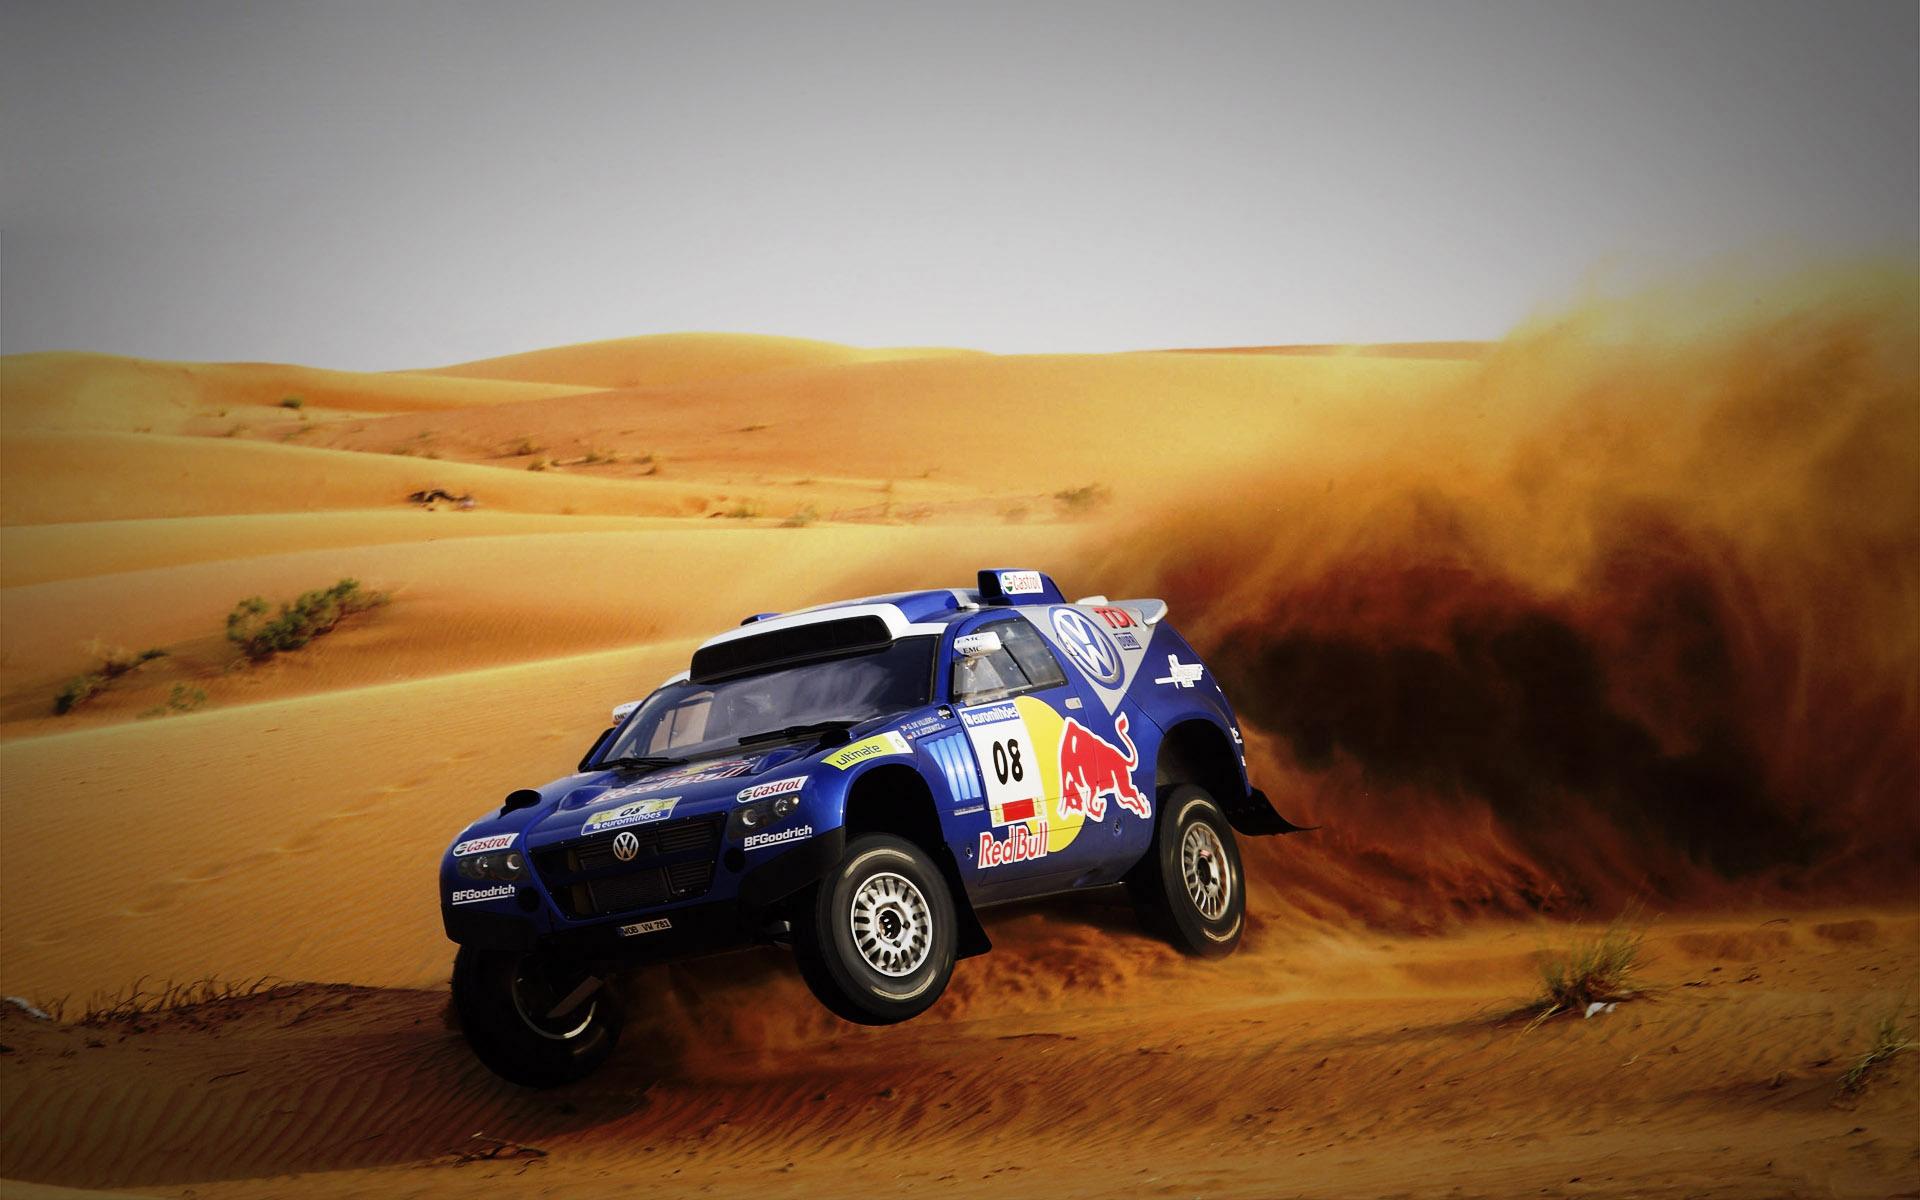 Il Dakar Rally Leganerd